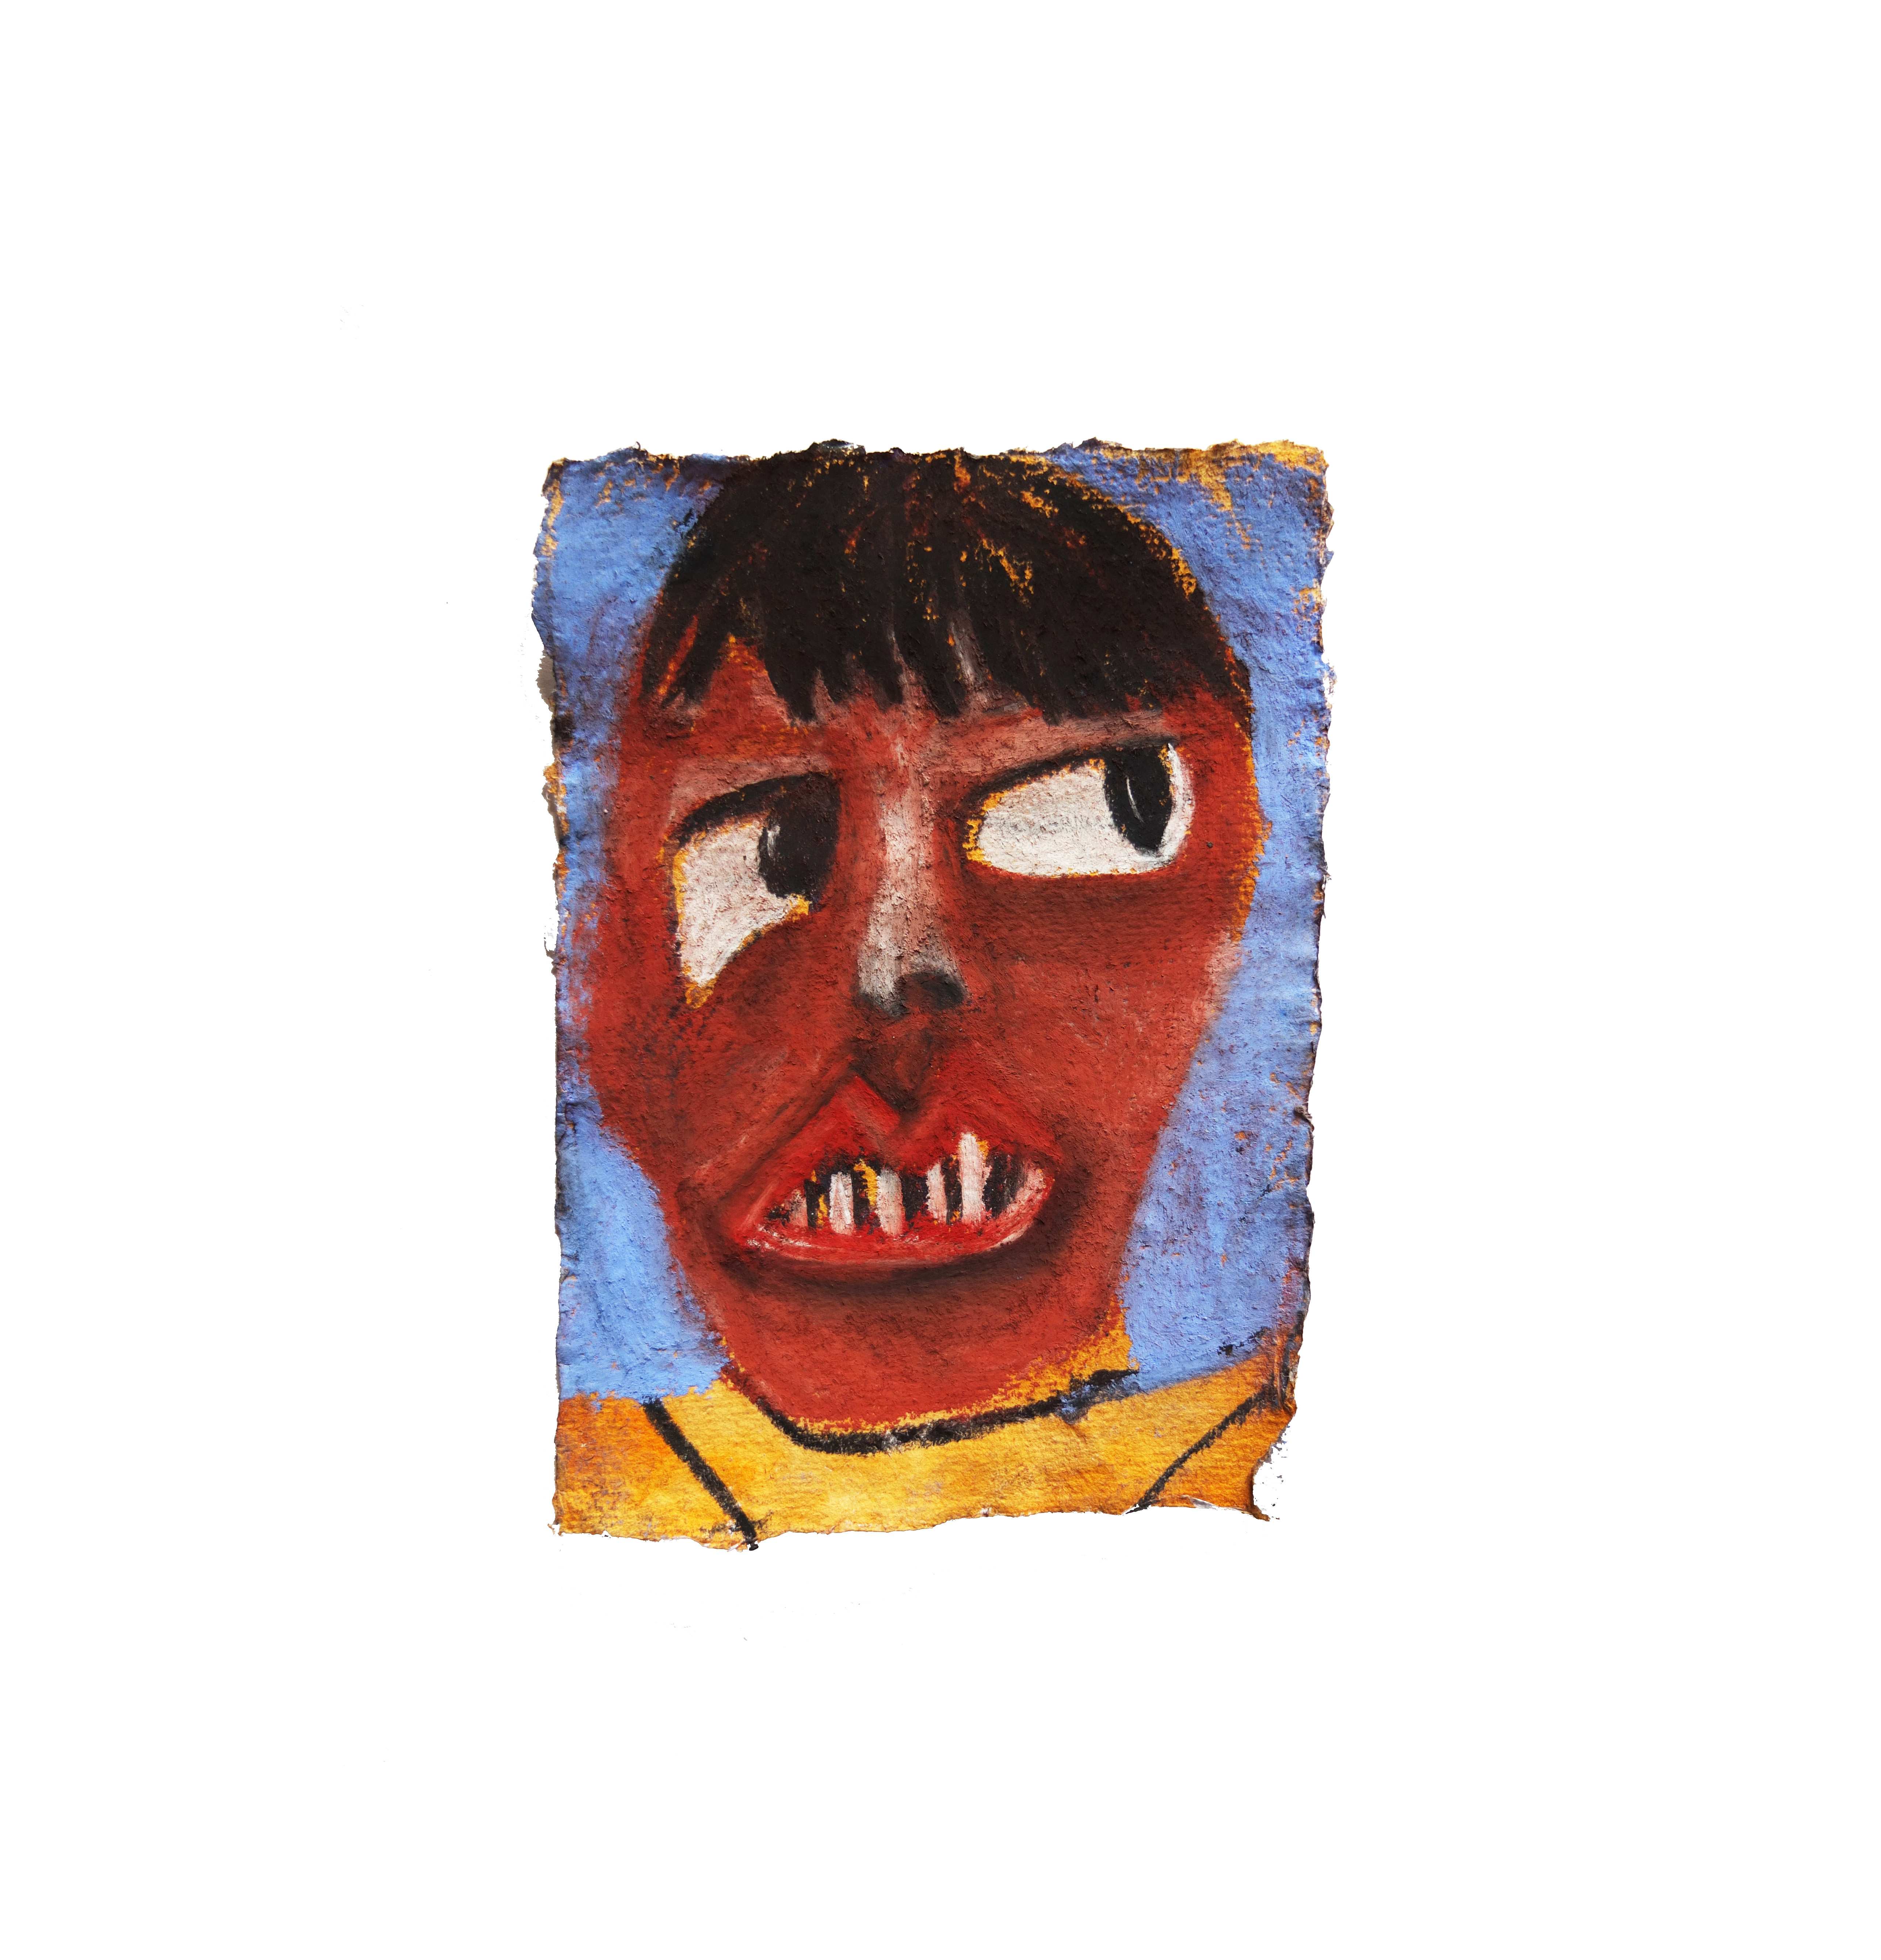 figure in yellow jumper. pastel on handmade paper, 12cm x 16cm